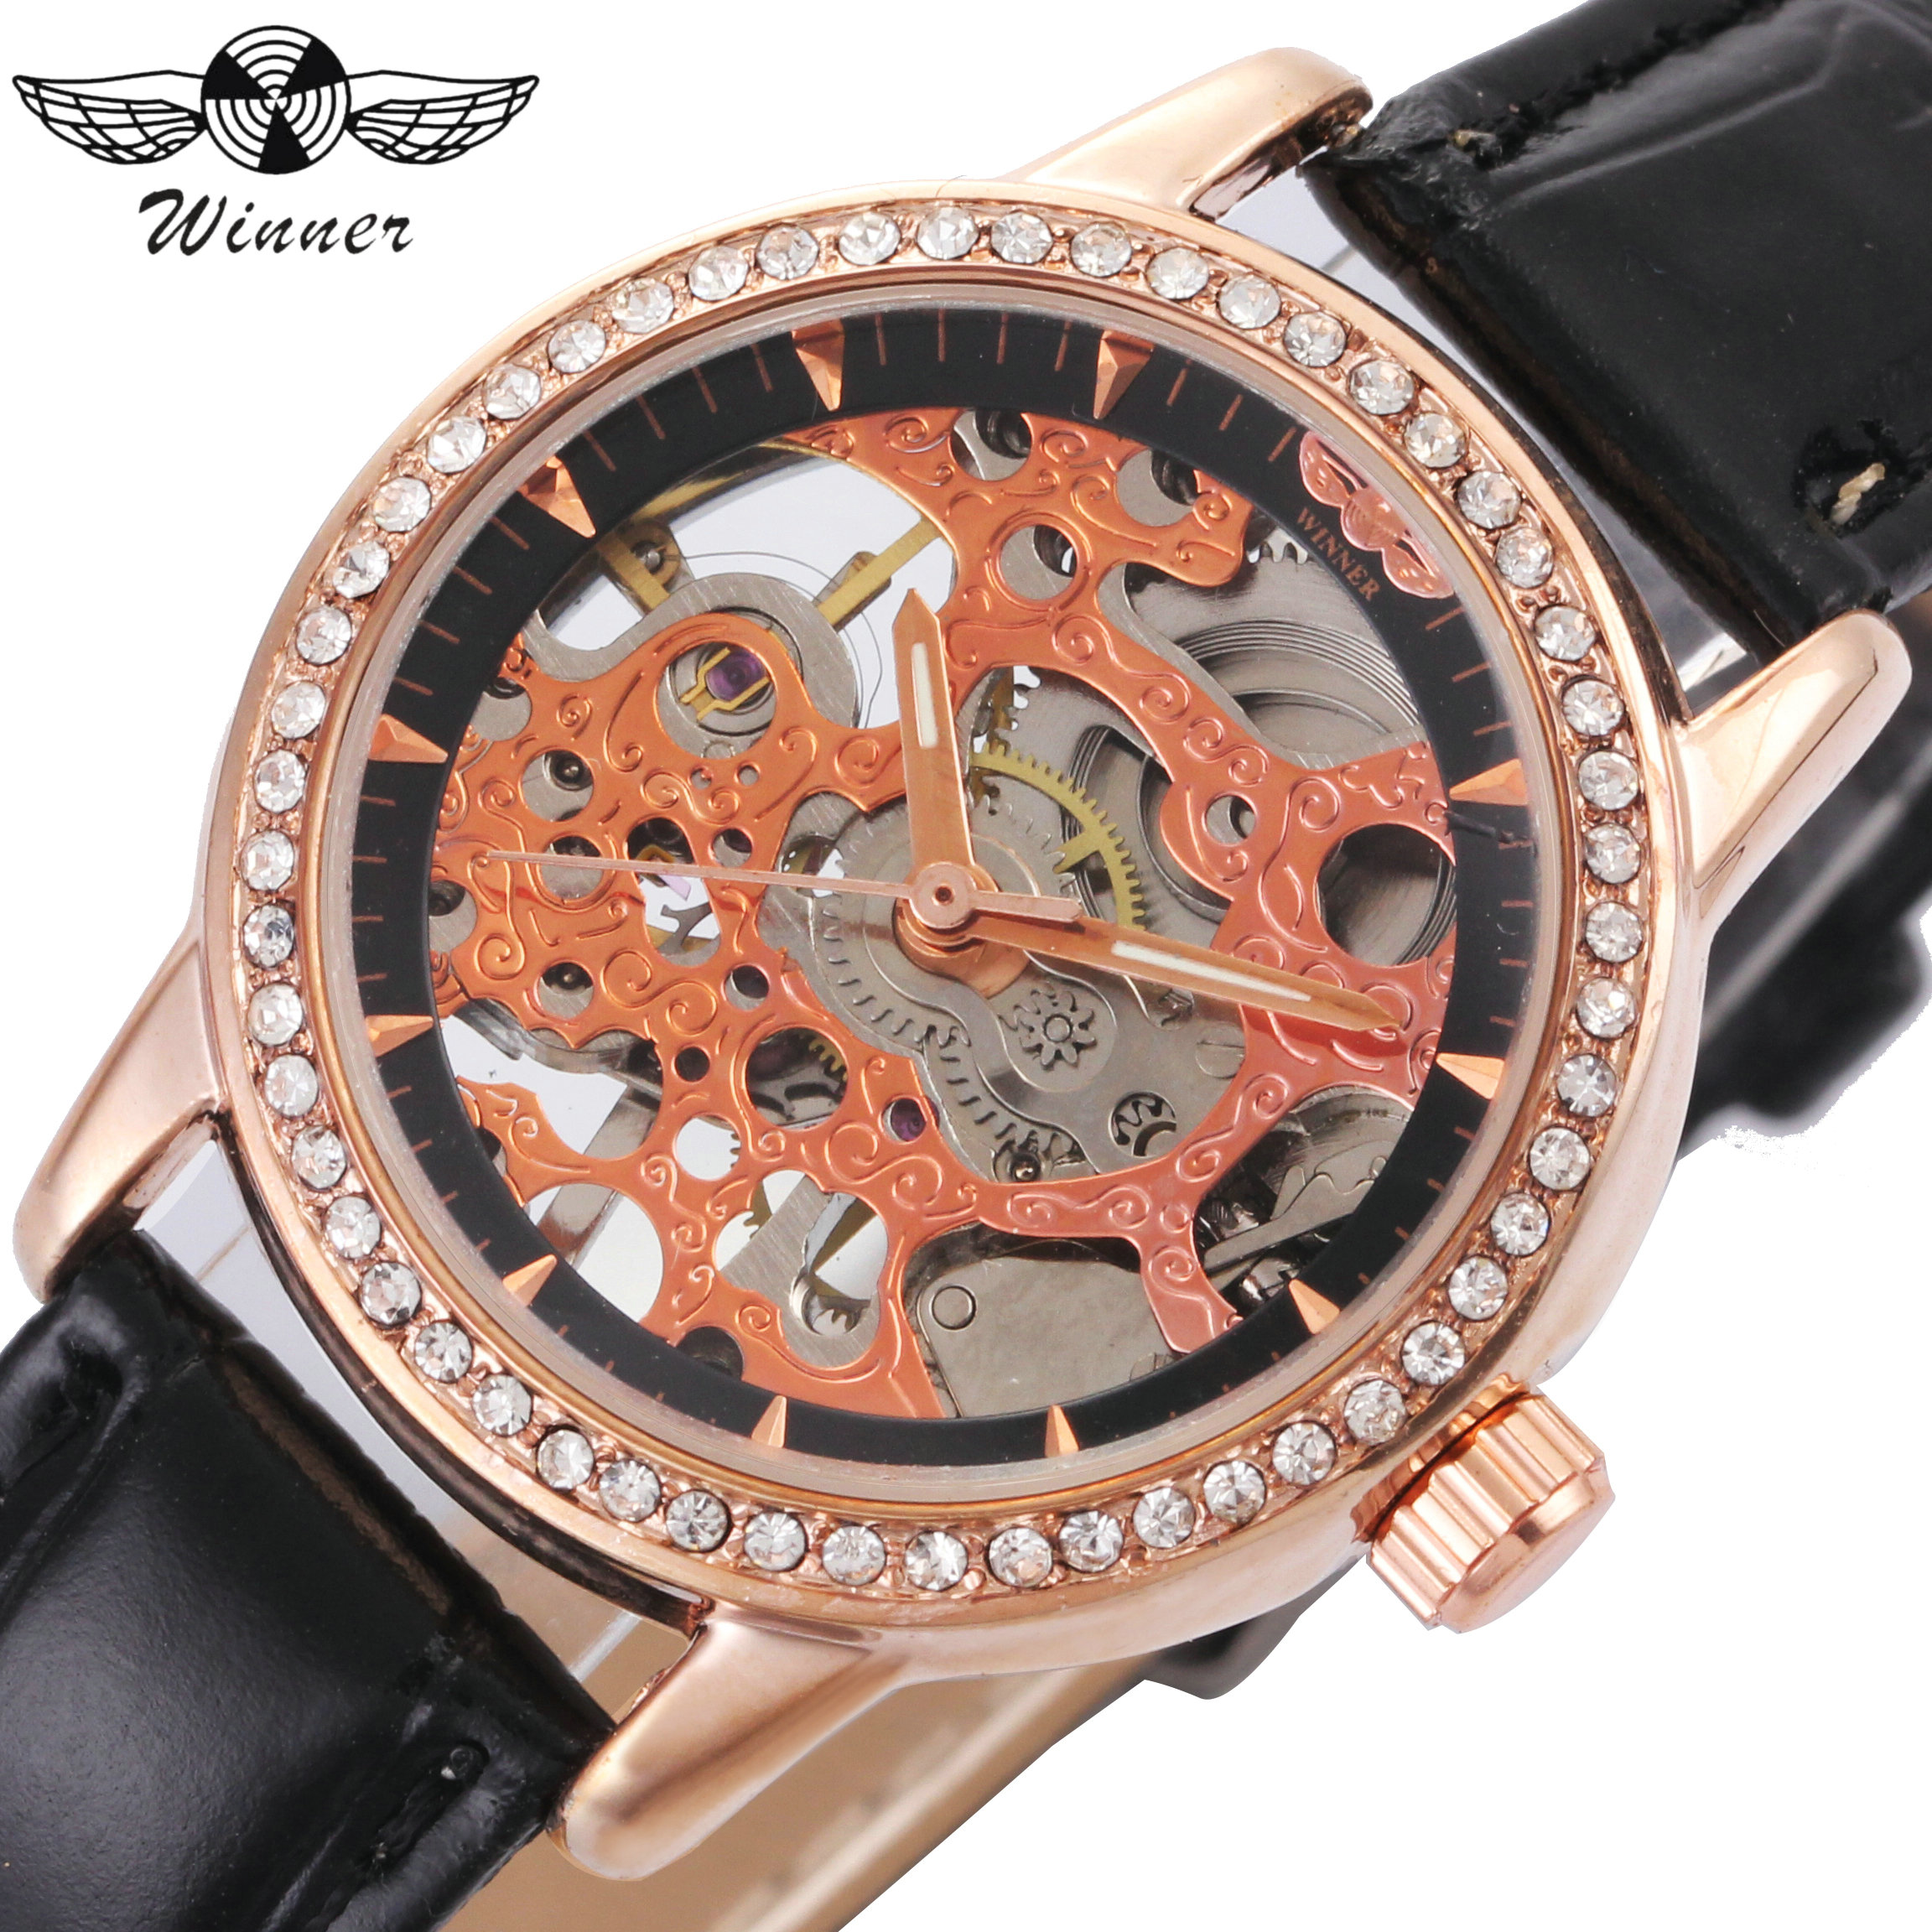 WINNER Women Watches Mechanical Watch Rose Golden Skeleton Dial Leather Strap Crystal Decoration Top Brand Luxury Elegant montre